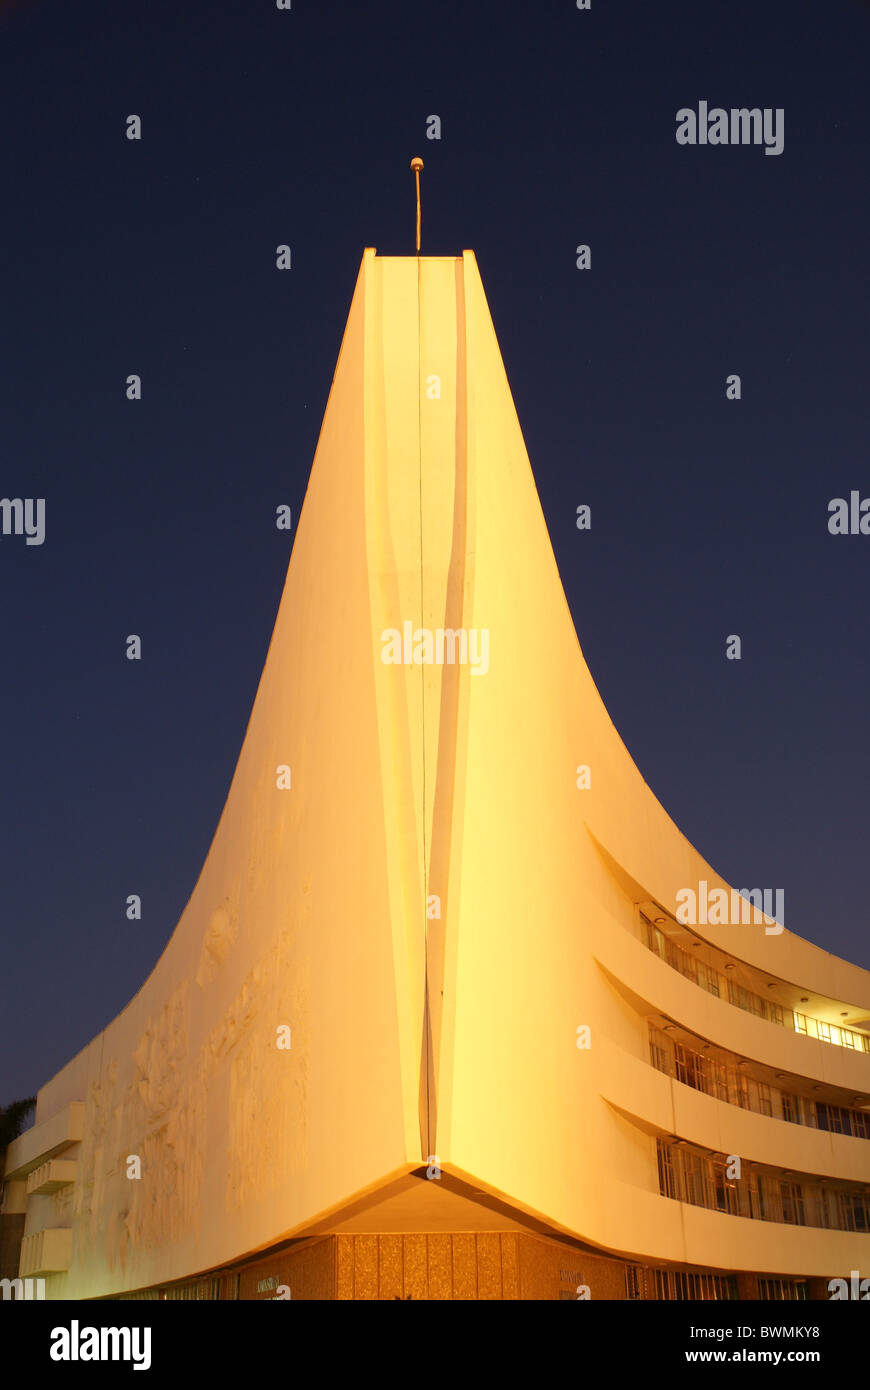 University of Pretoria Ark building - Stock Image